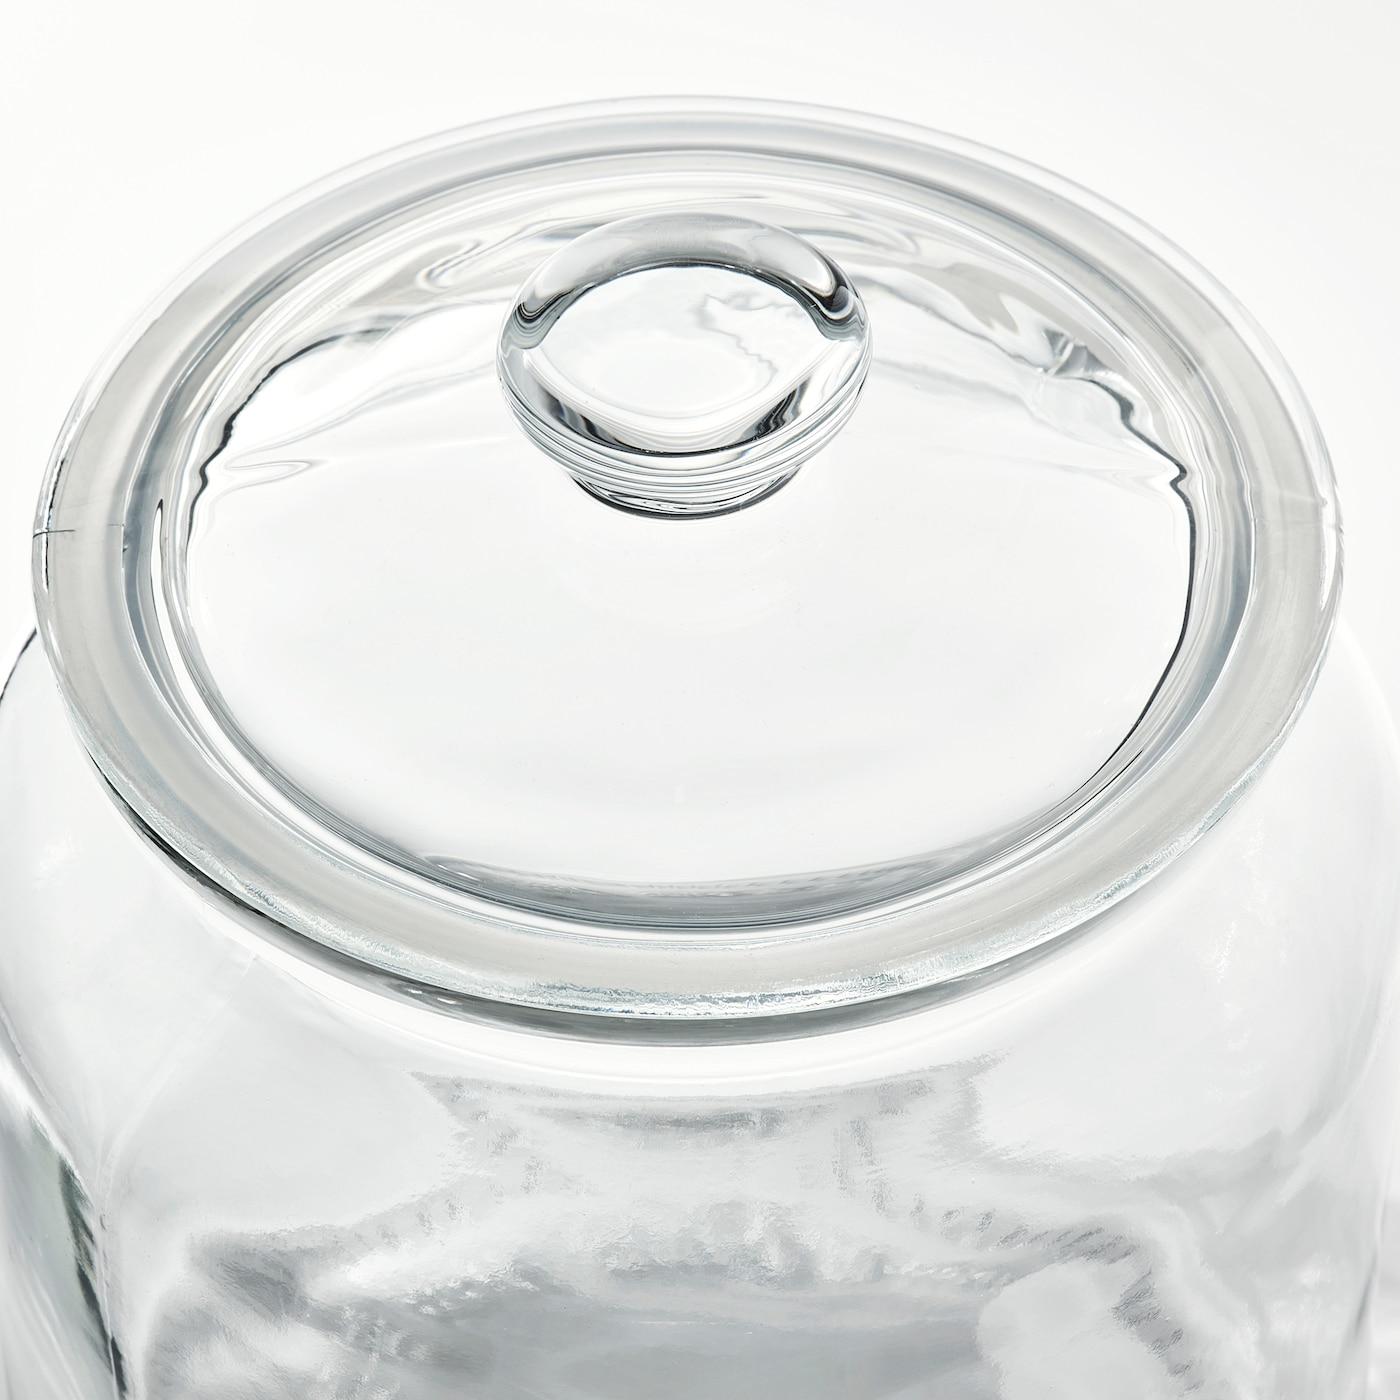 ВАРДАГЕН банка із кришкою прозоре скло 18 см 15 см 1.9 л